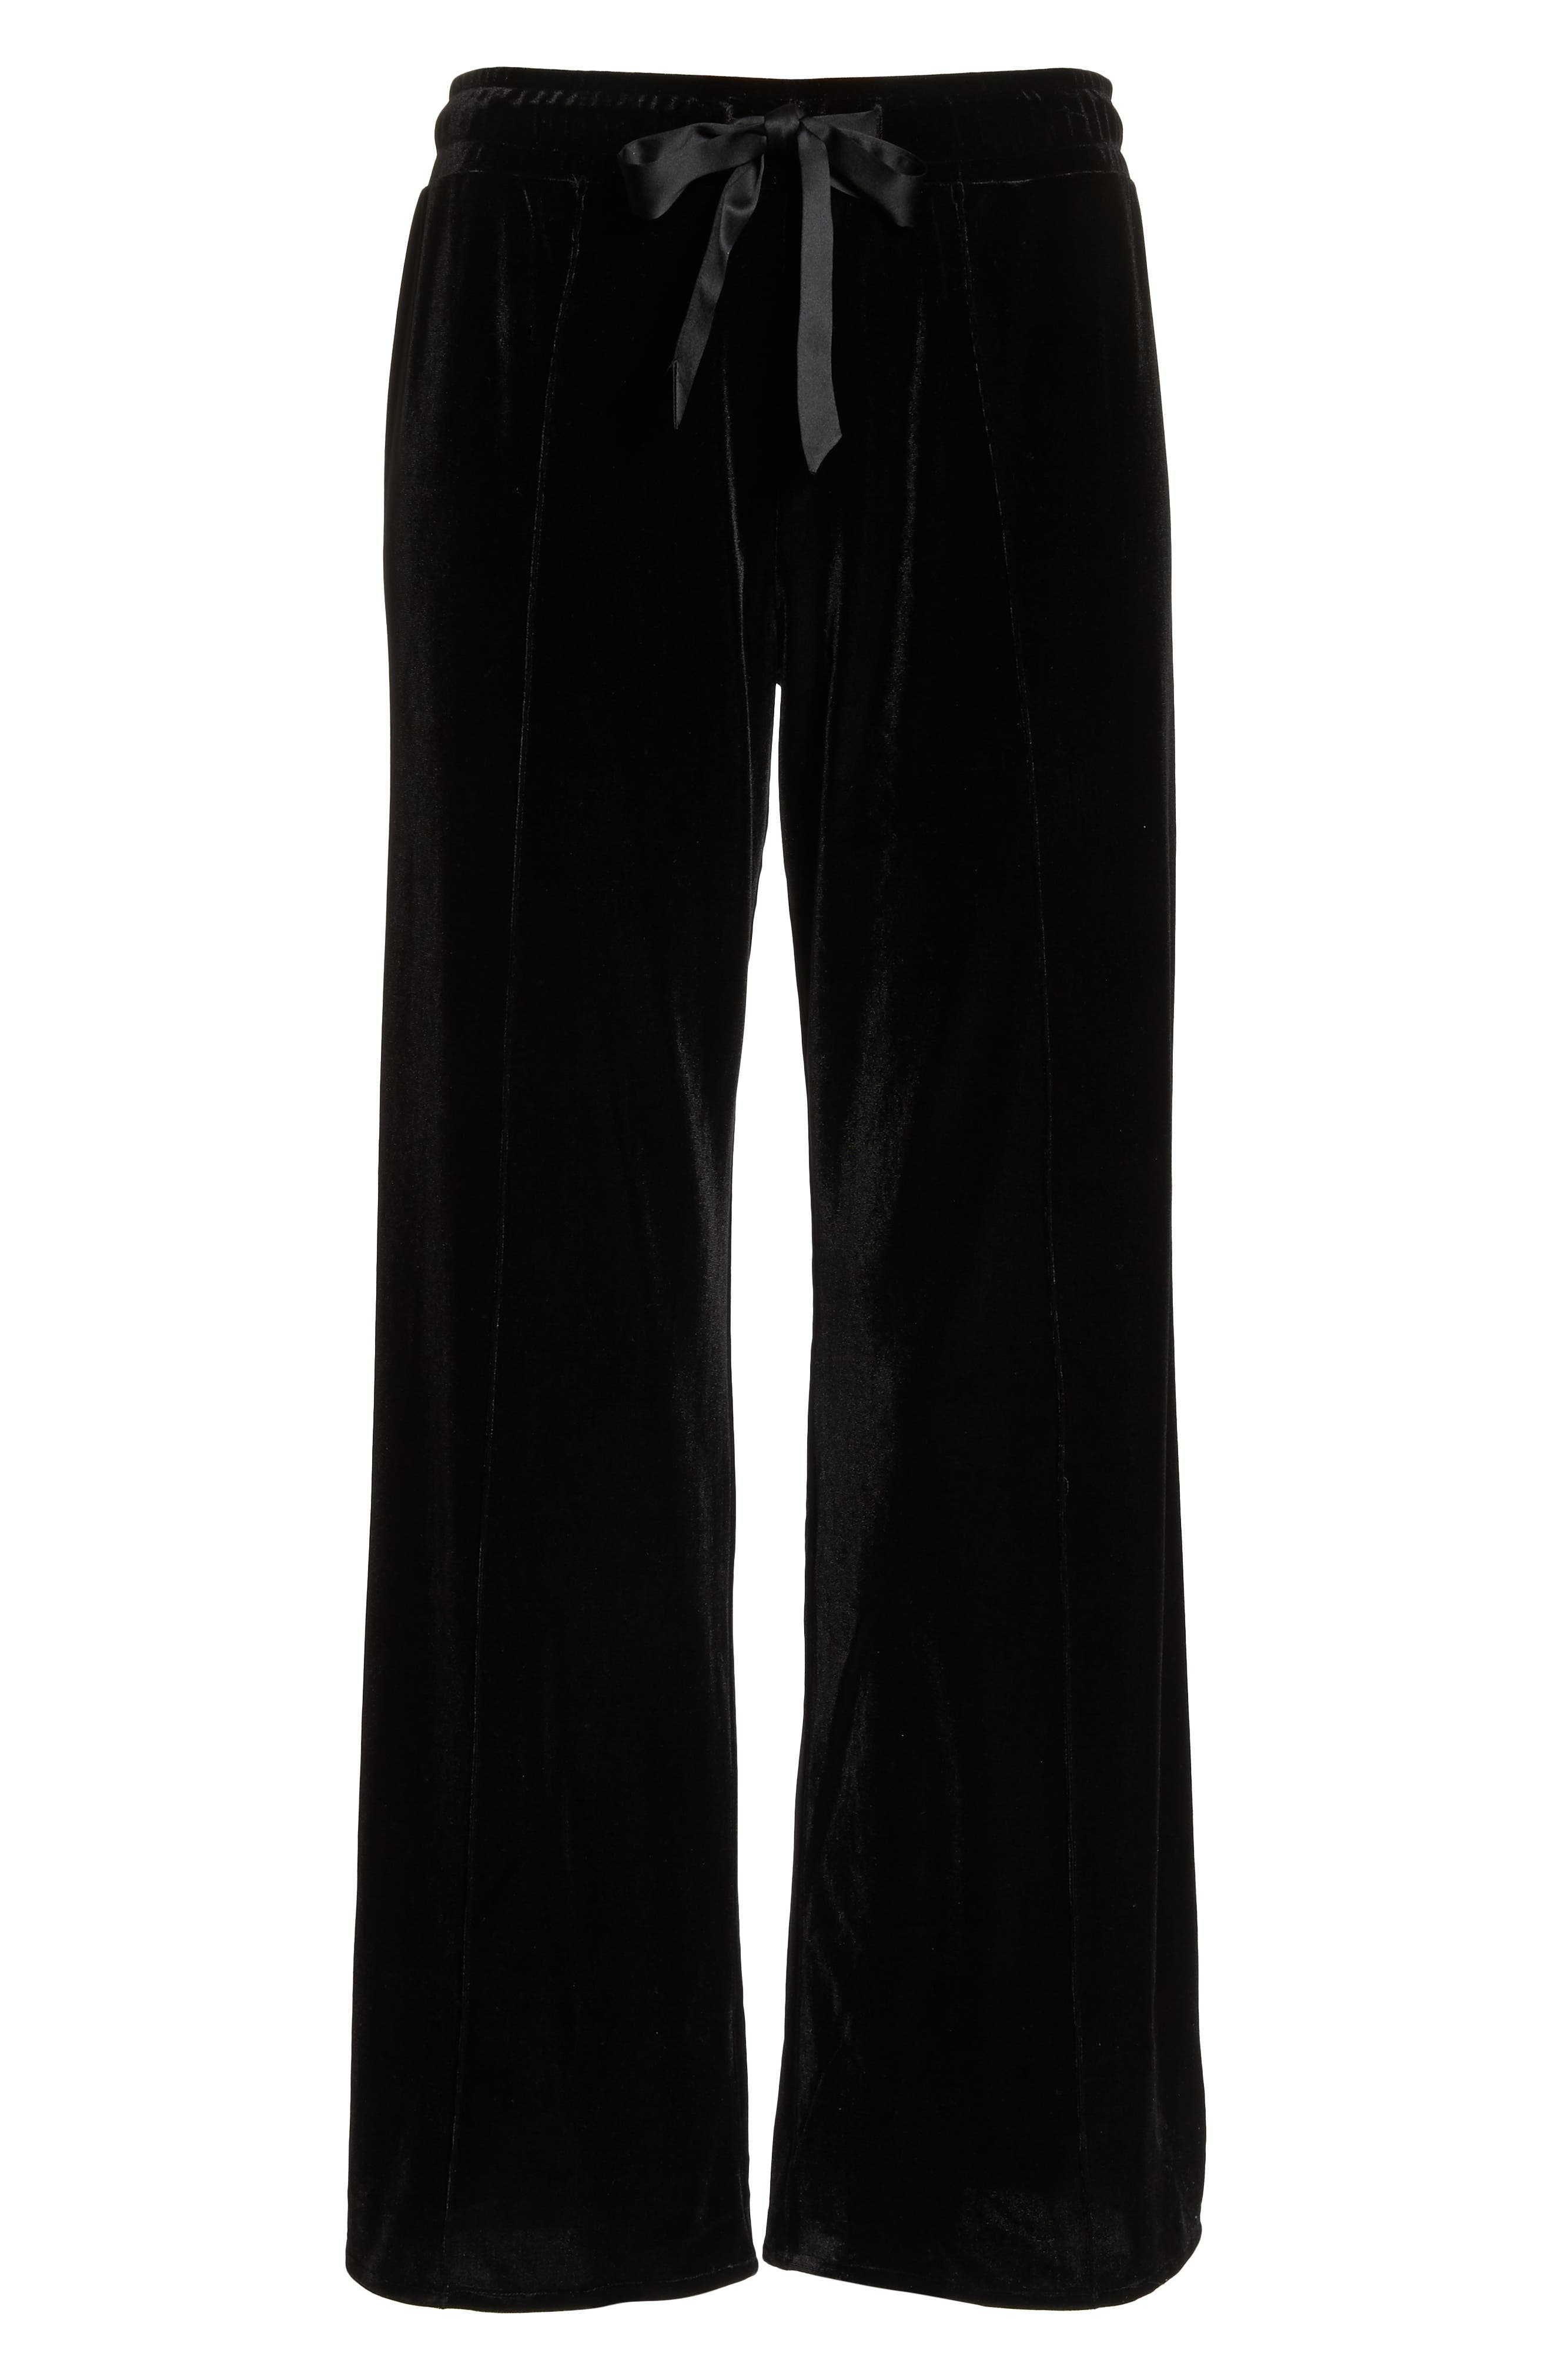 Dream Away Velour Lounge Pants,                             Alternate thumbnail 6, color,                             BLACK